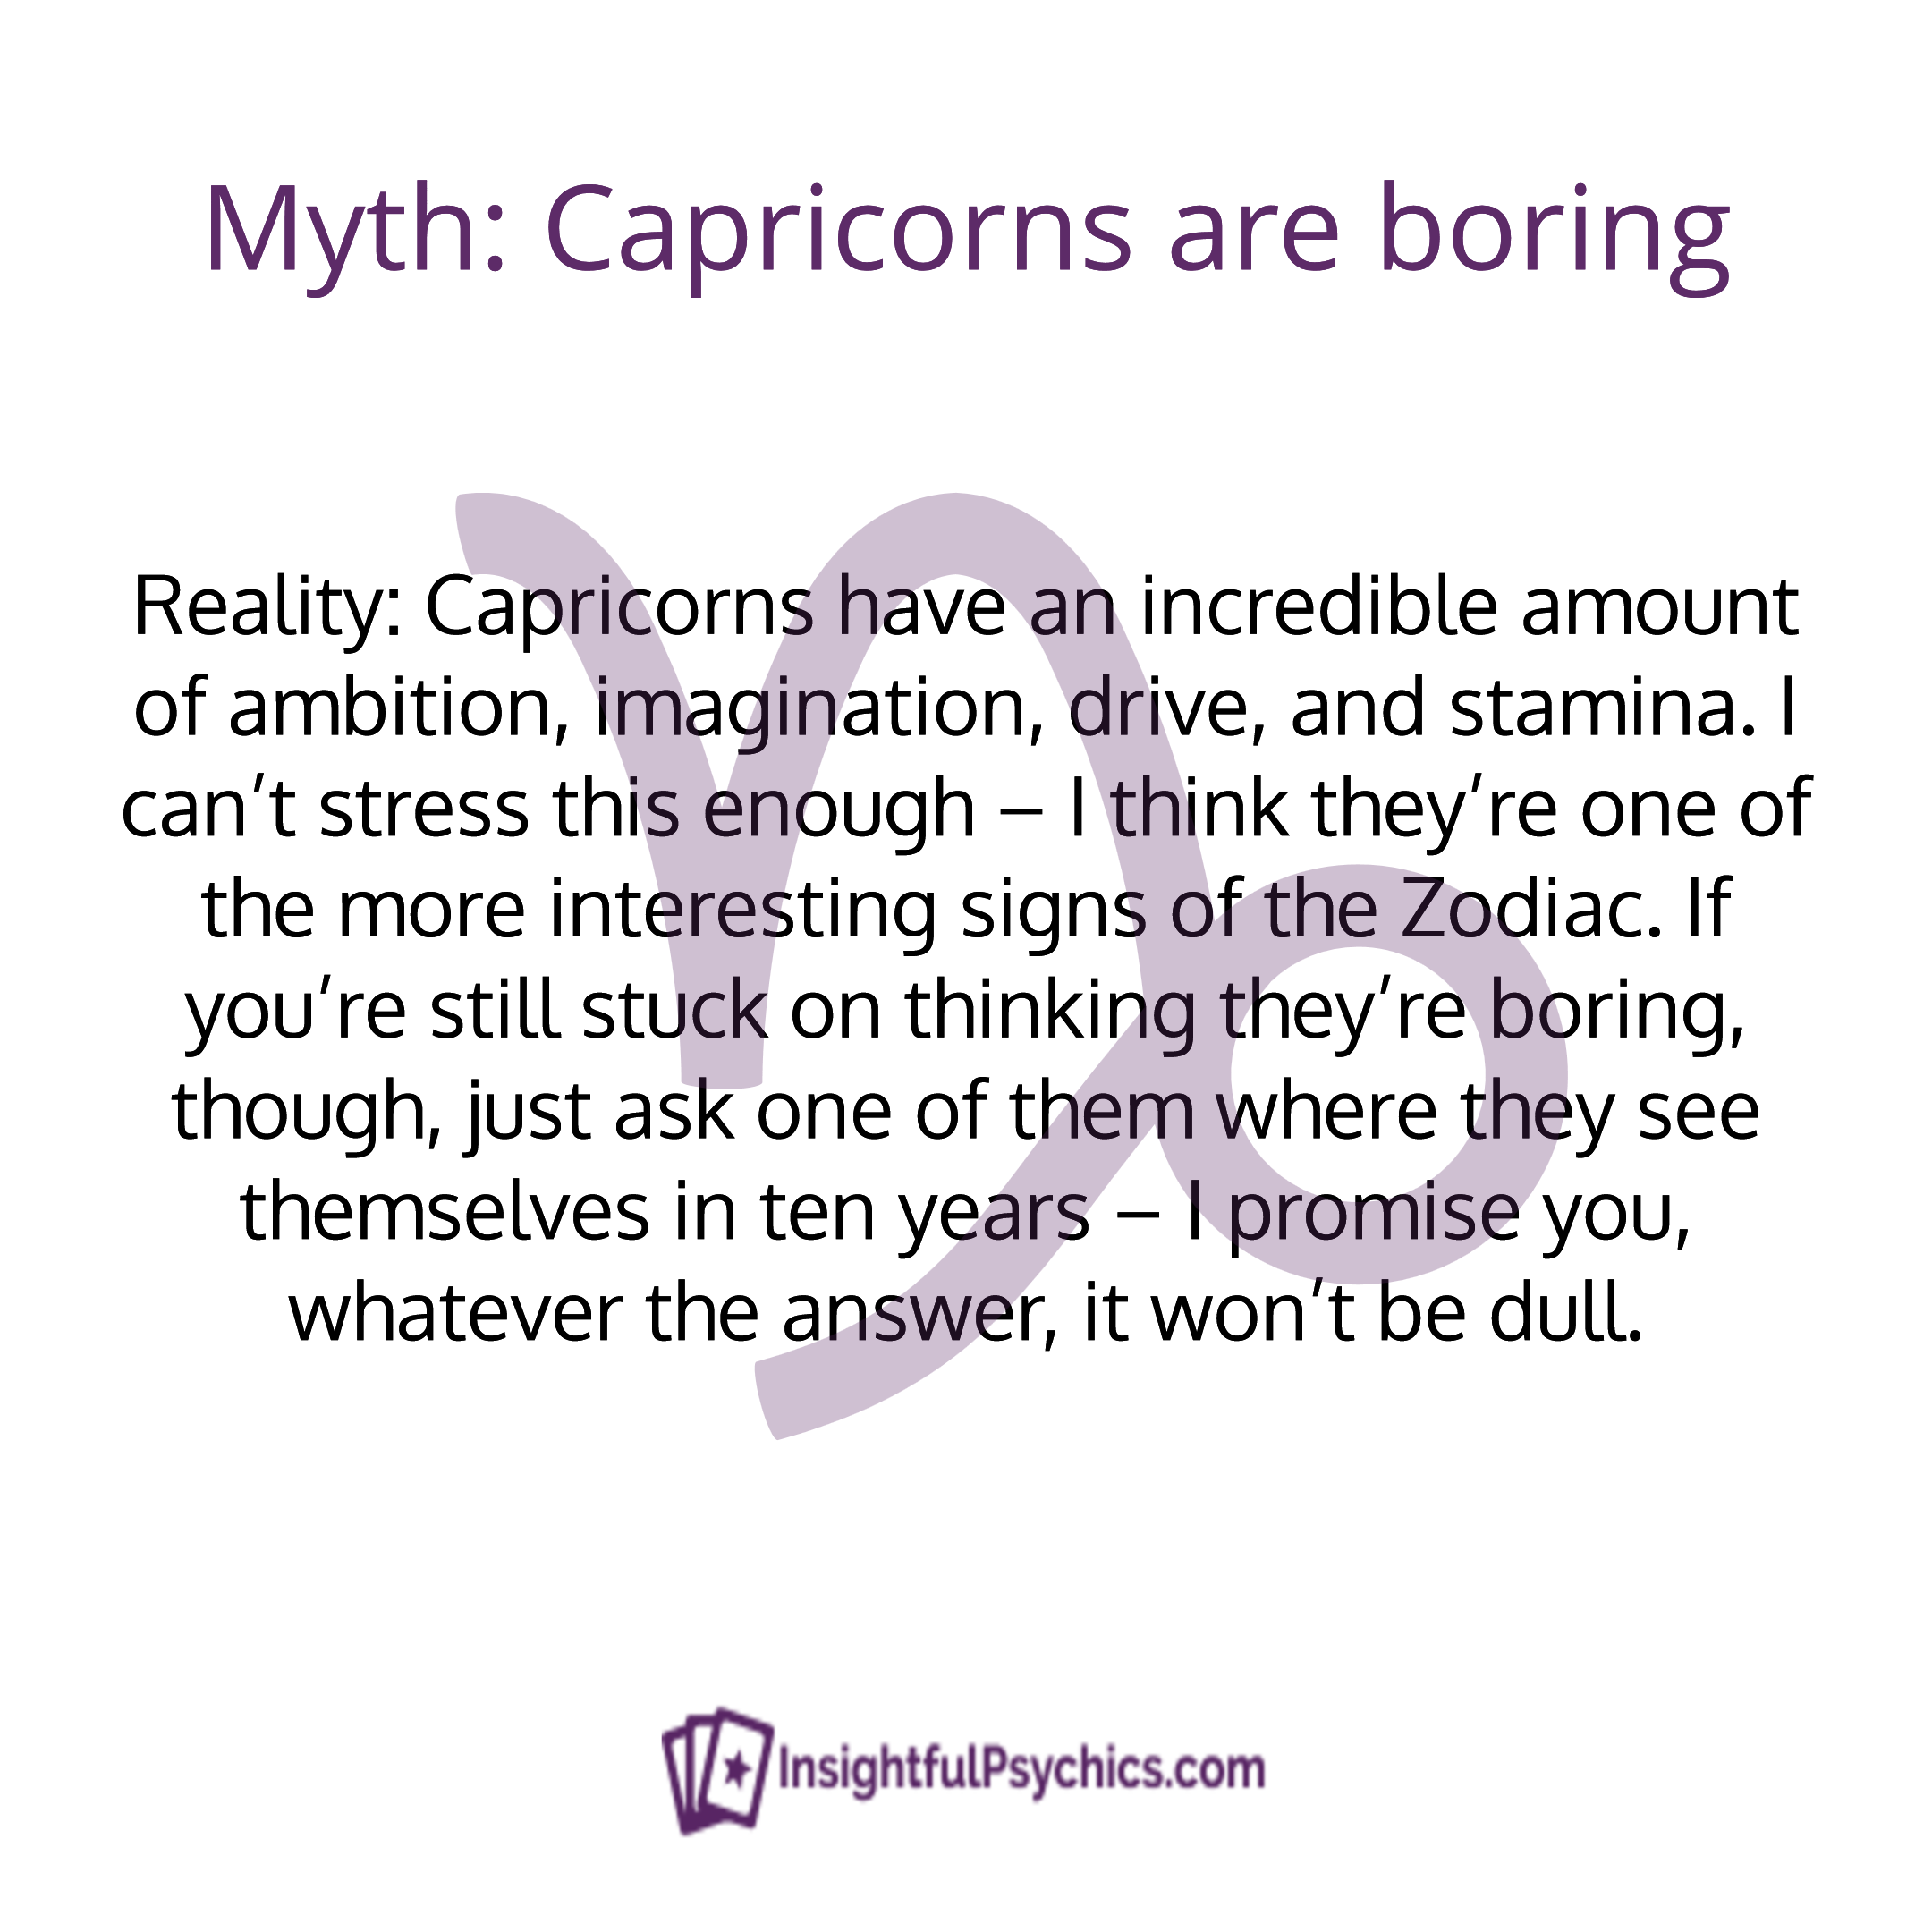 Capricorn Sign Dates, Traits, & More   Capricorn quotes, Horoscope ...